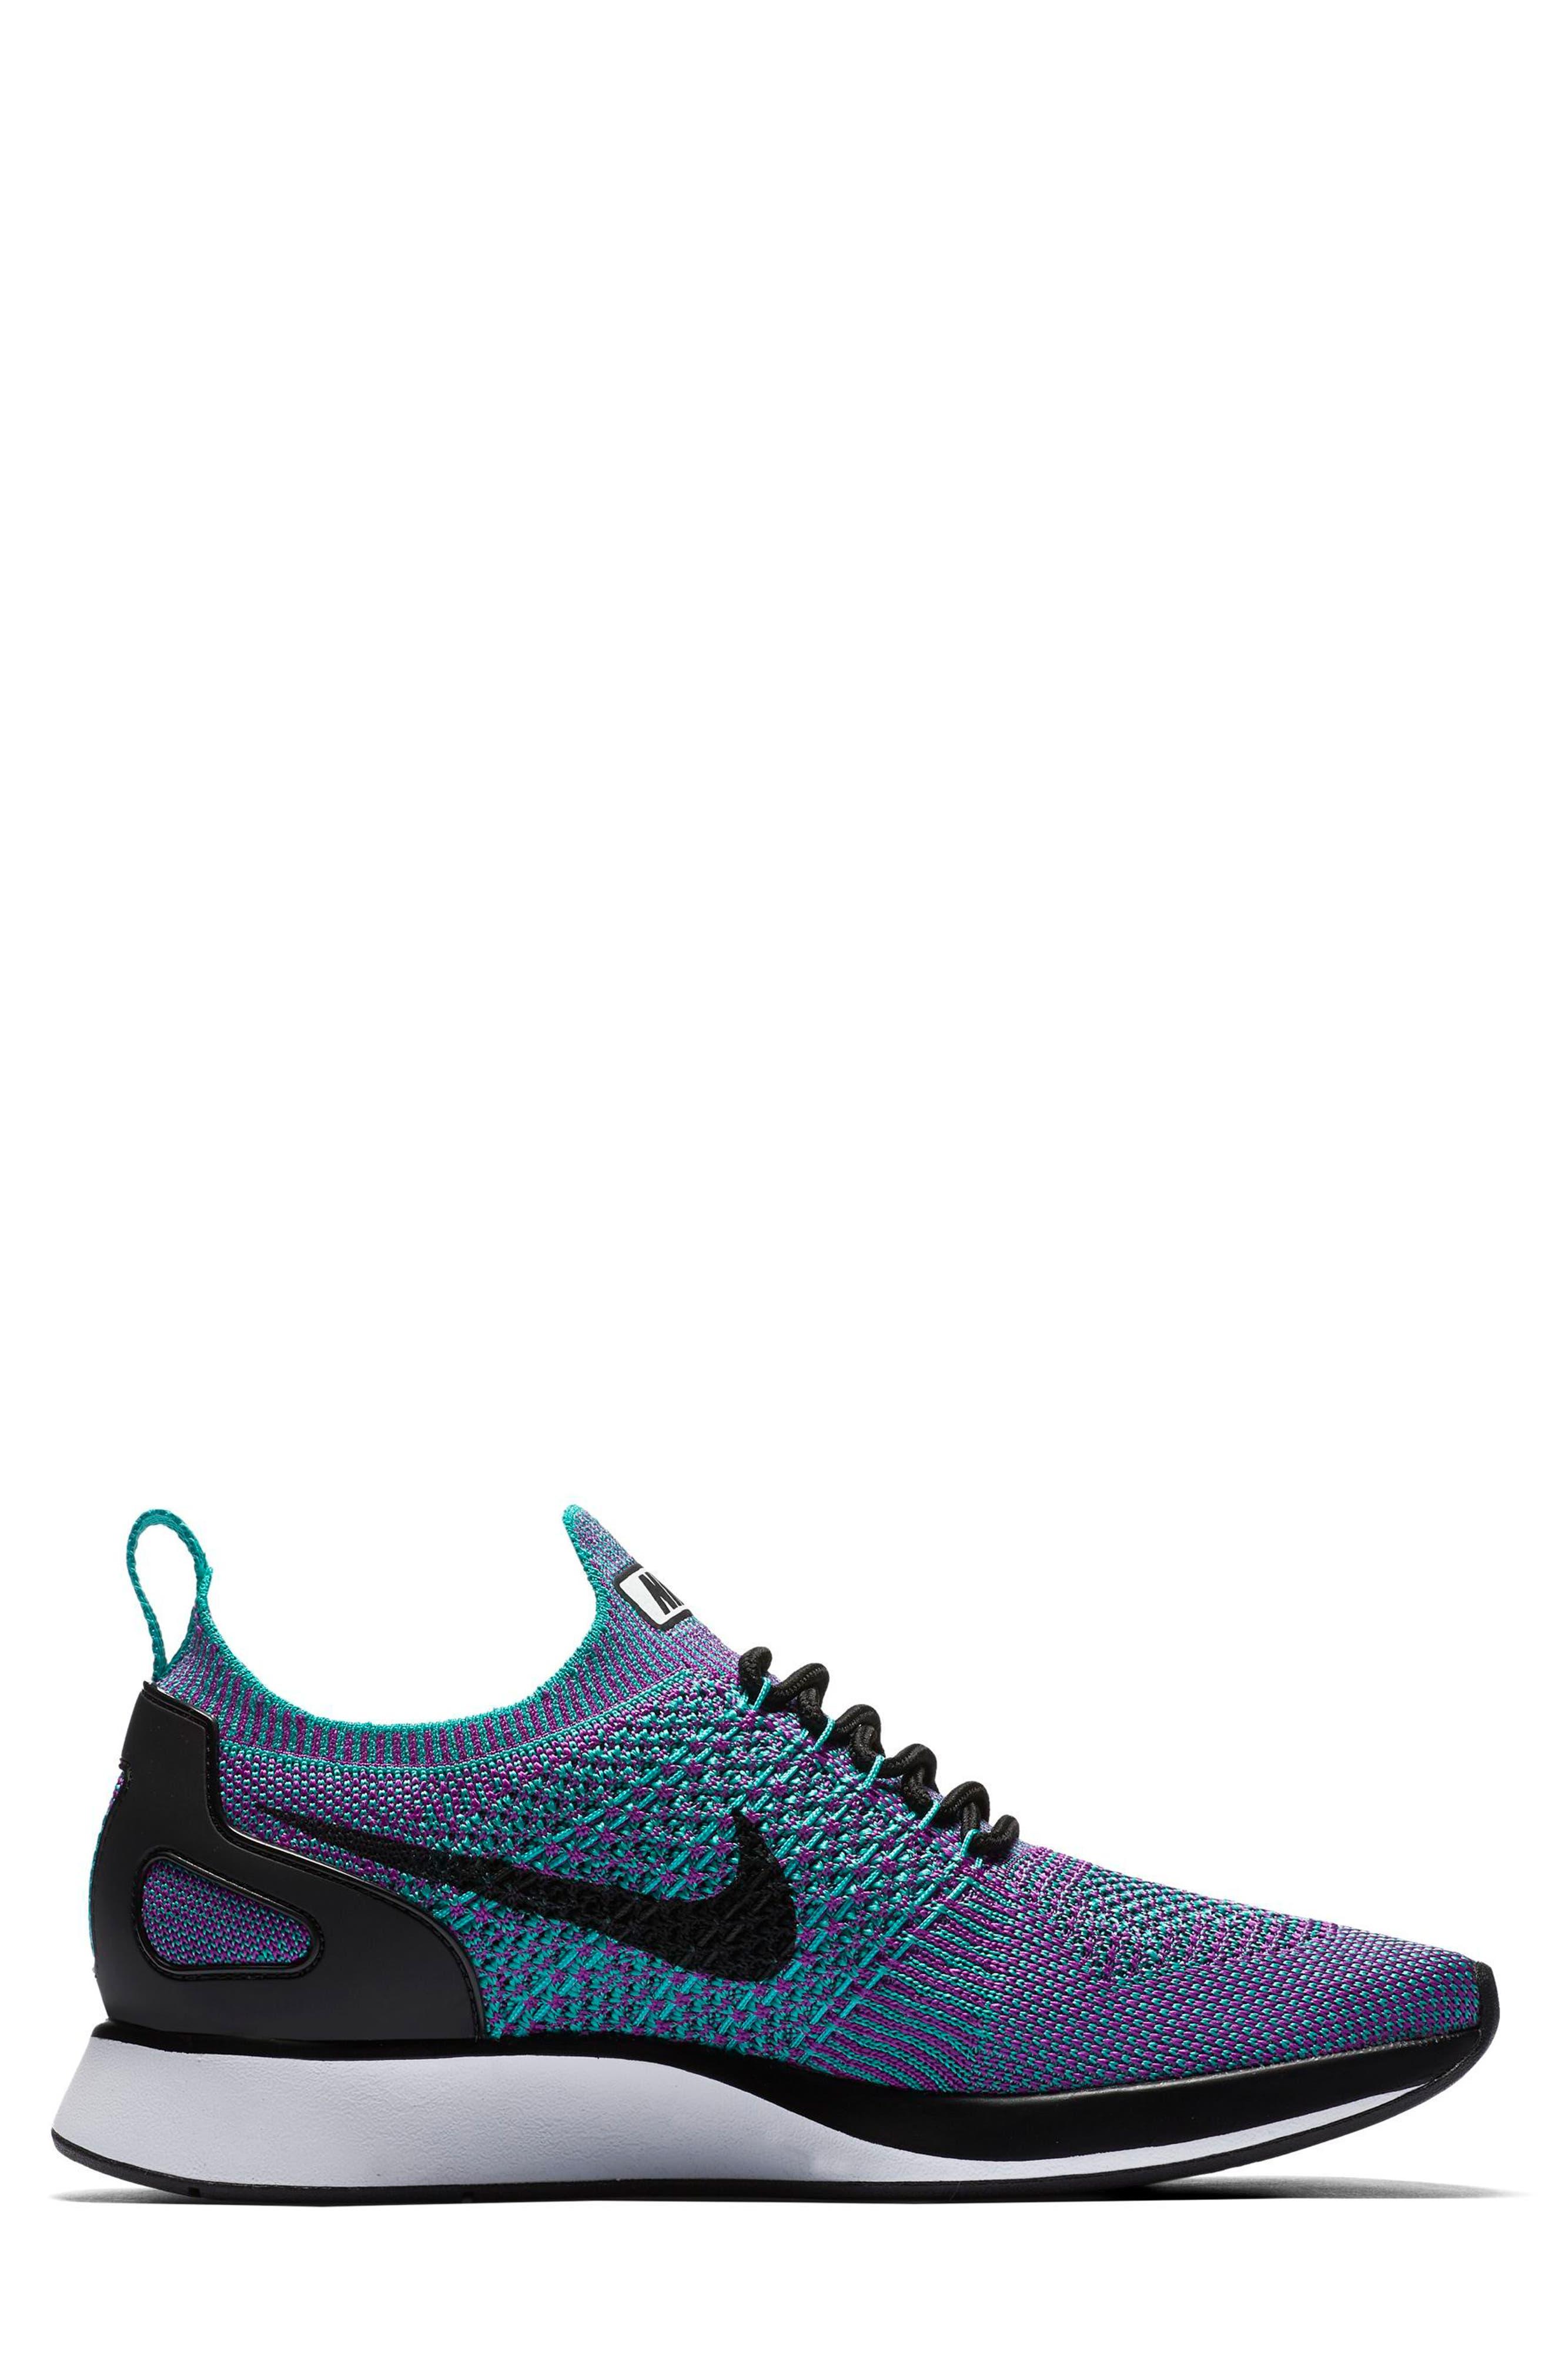 Air Zoom Mariah Flyknit Racer Sneaker,                             Alternate thumbnail 3, color,                             CLEAR JADE/ BLACK